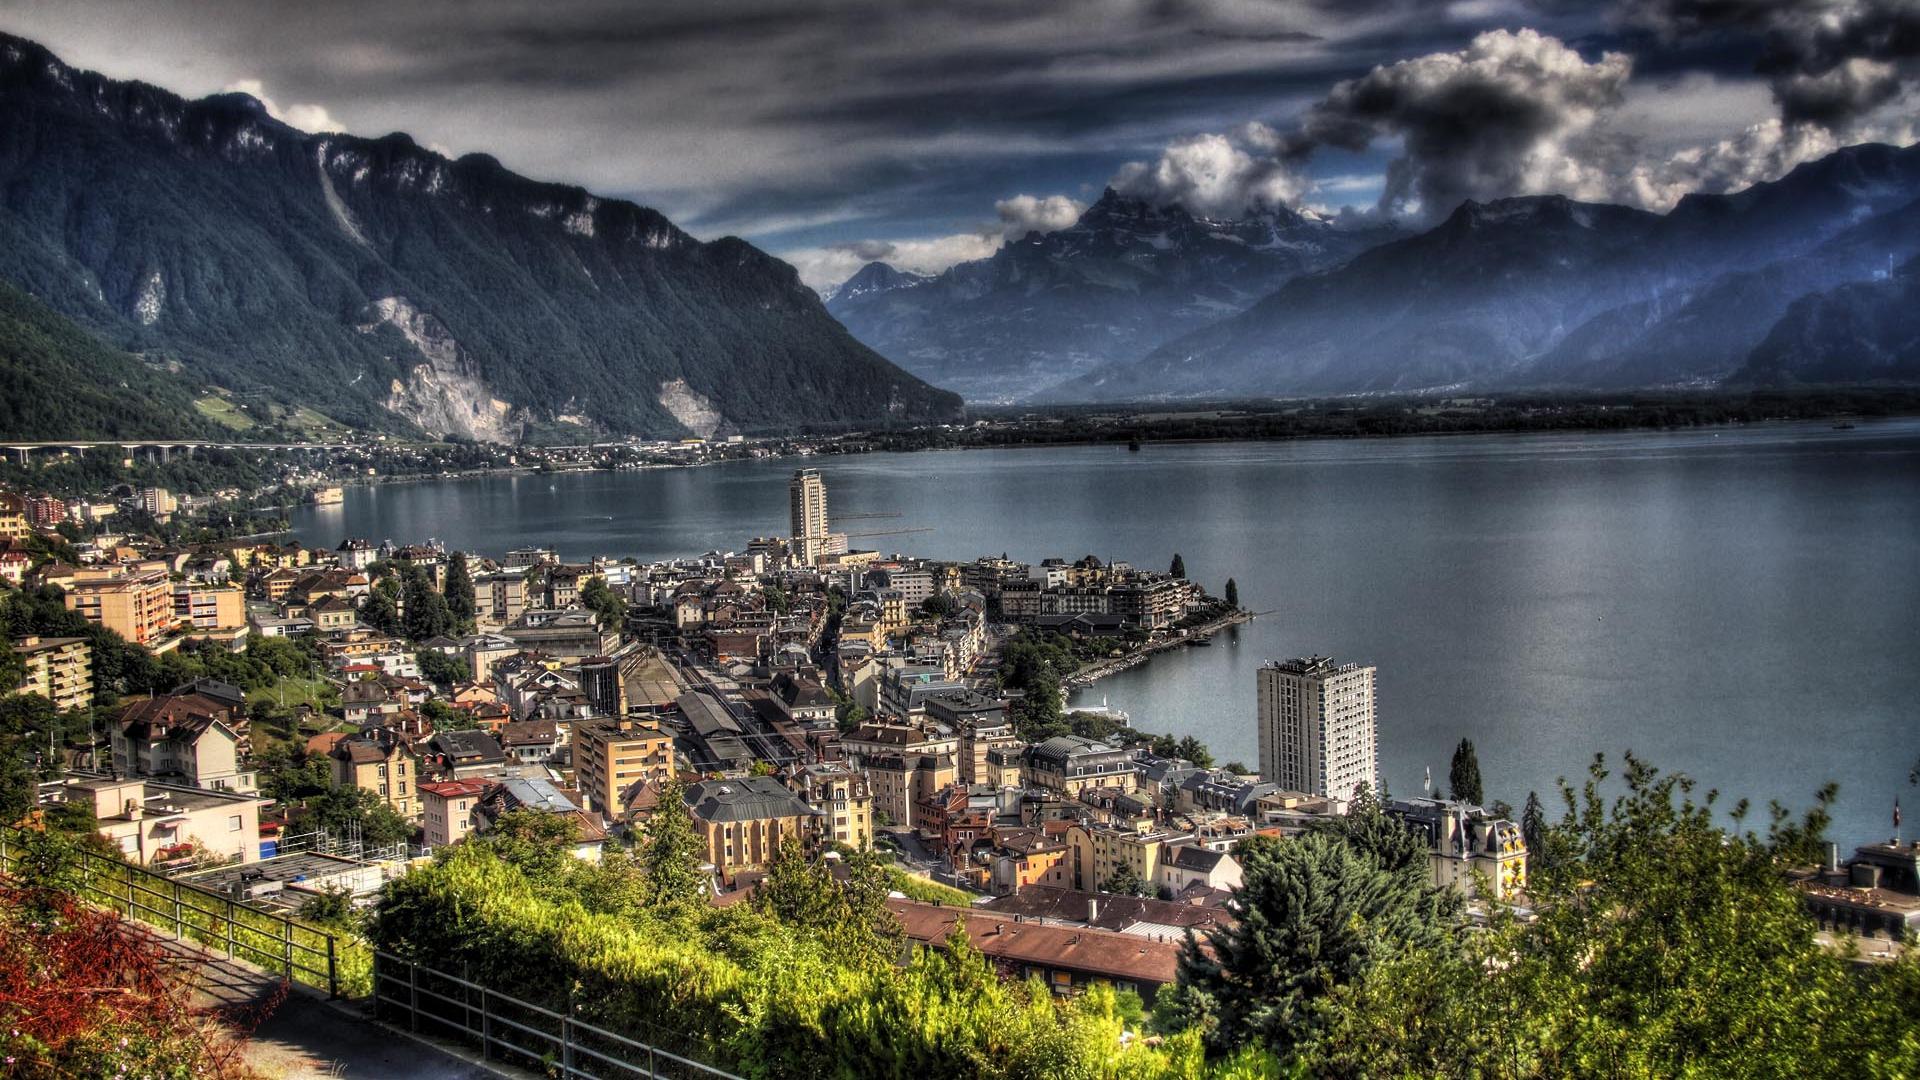 Montreux switzerland full hd desktop wallpapers 1080p - Switzerland wallpaper full hd ...